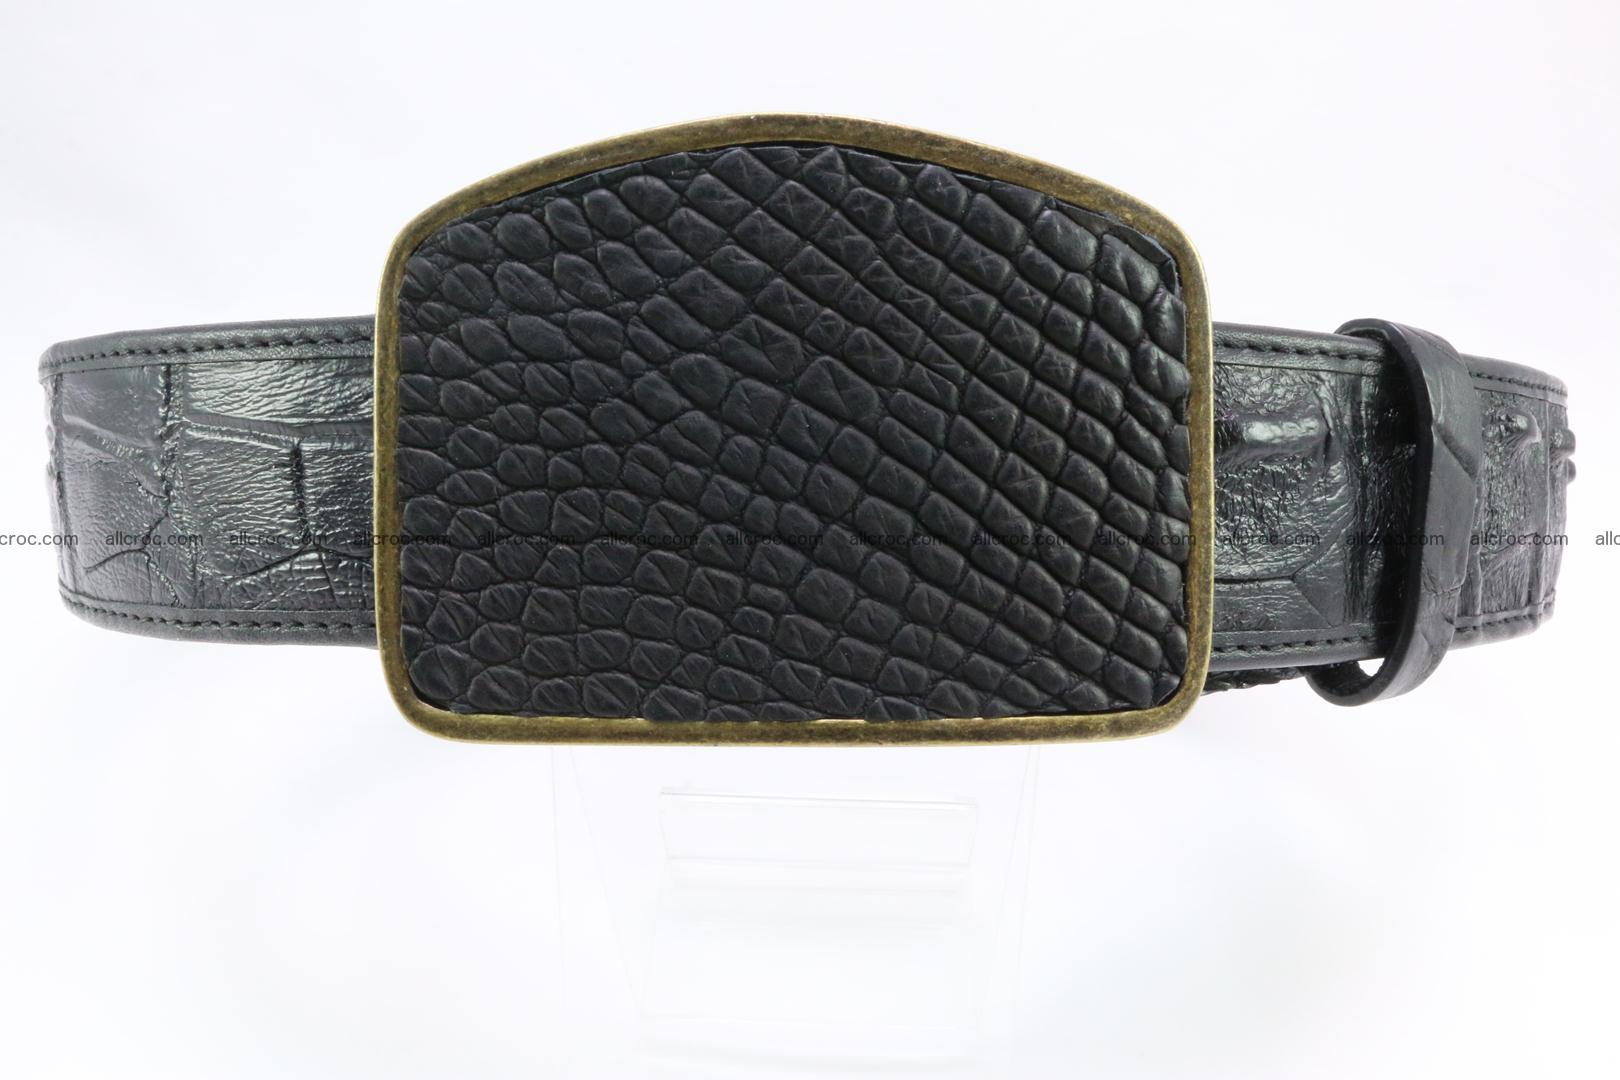 Genuine crocodile leather hornback belt 083 Foto 0